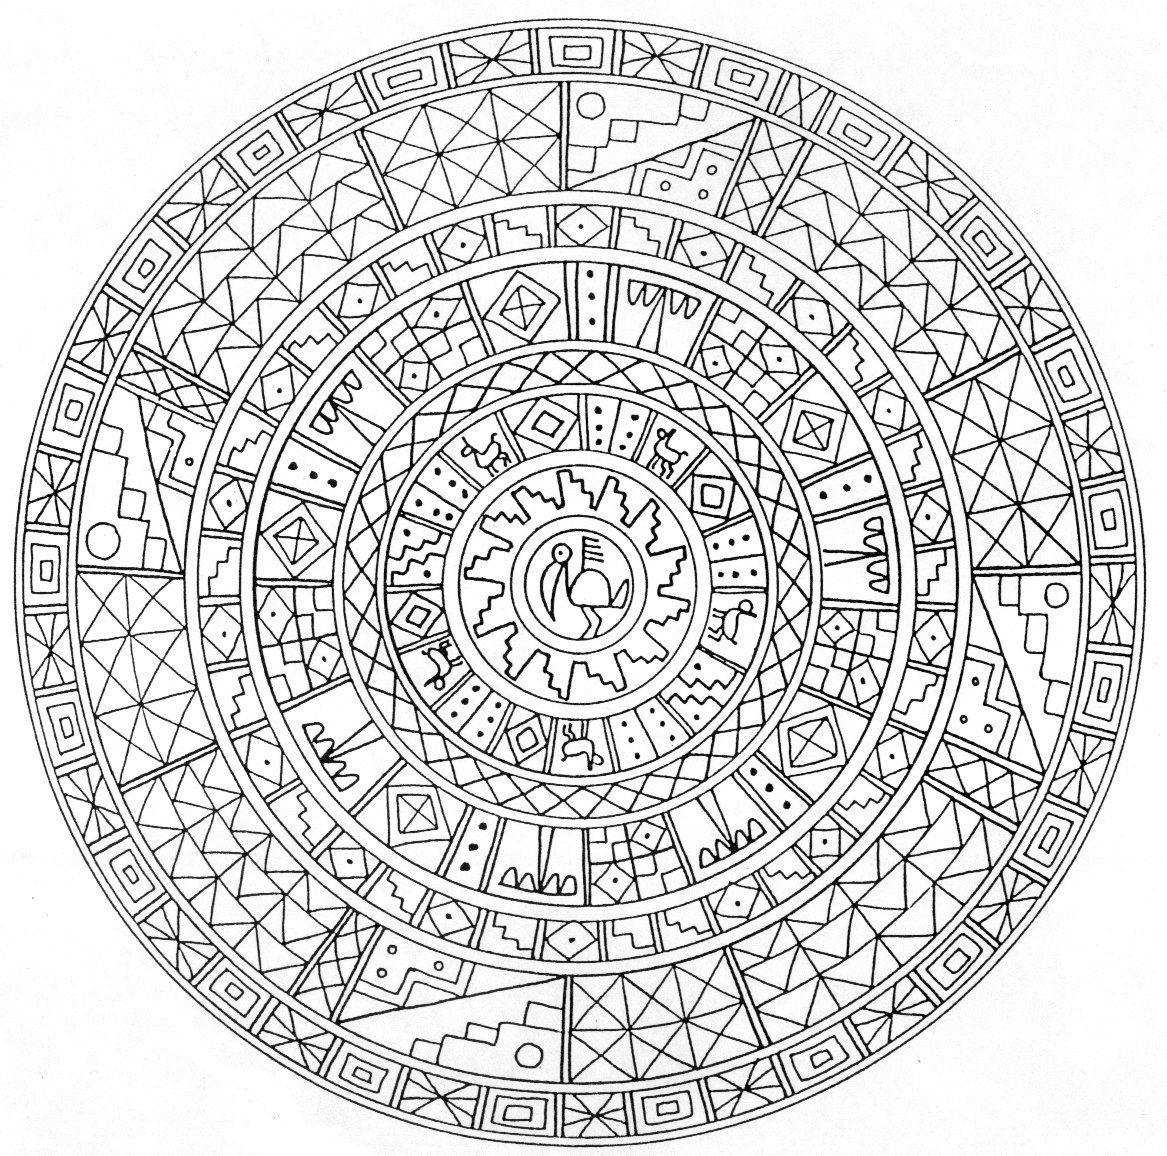 Animal mandala coloring pages to print - 29 Printable Mandala Abstract Colouring Pages For Meditation